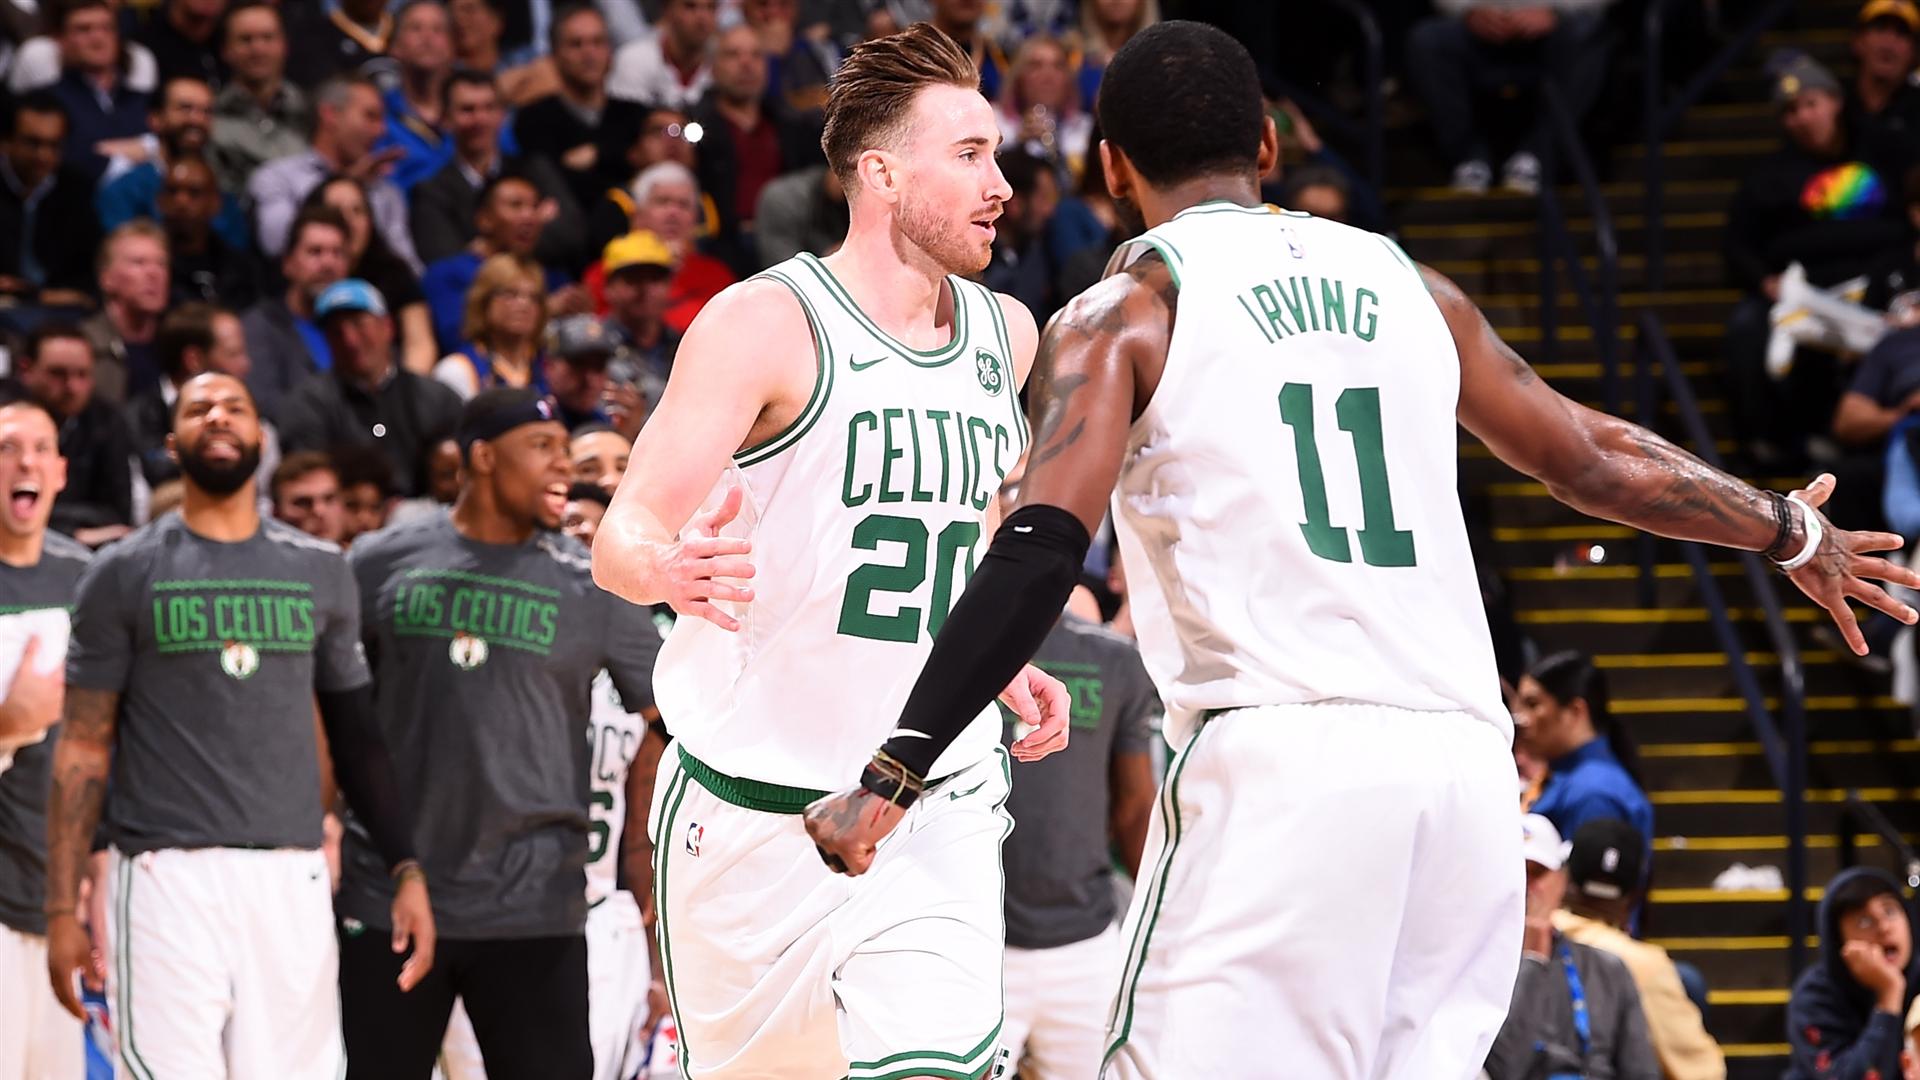 Gordon Hayward Stars As Boston Celtics Blowout The - Kyrie Irving And Gordon Hayward , HD Wallpaper & Backgrounds